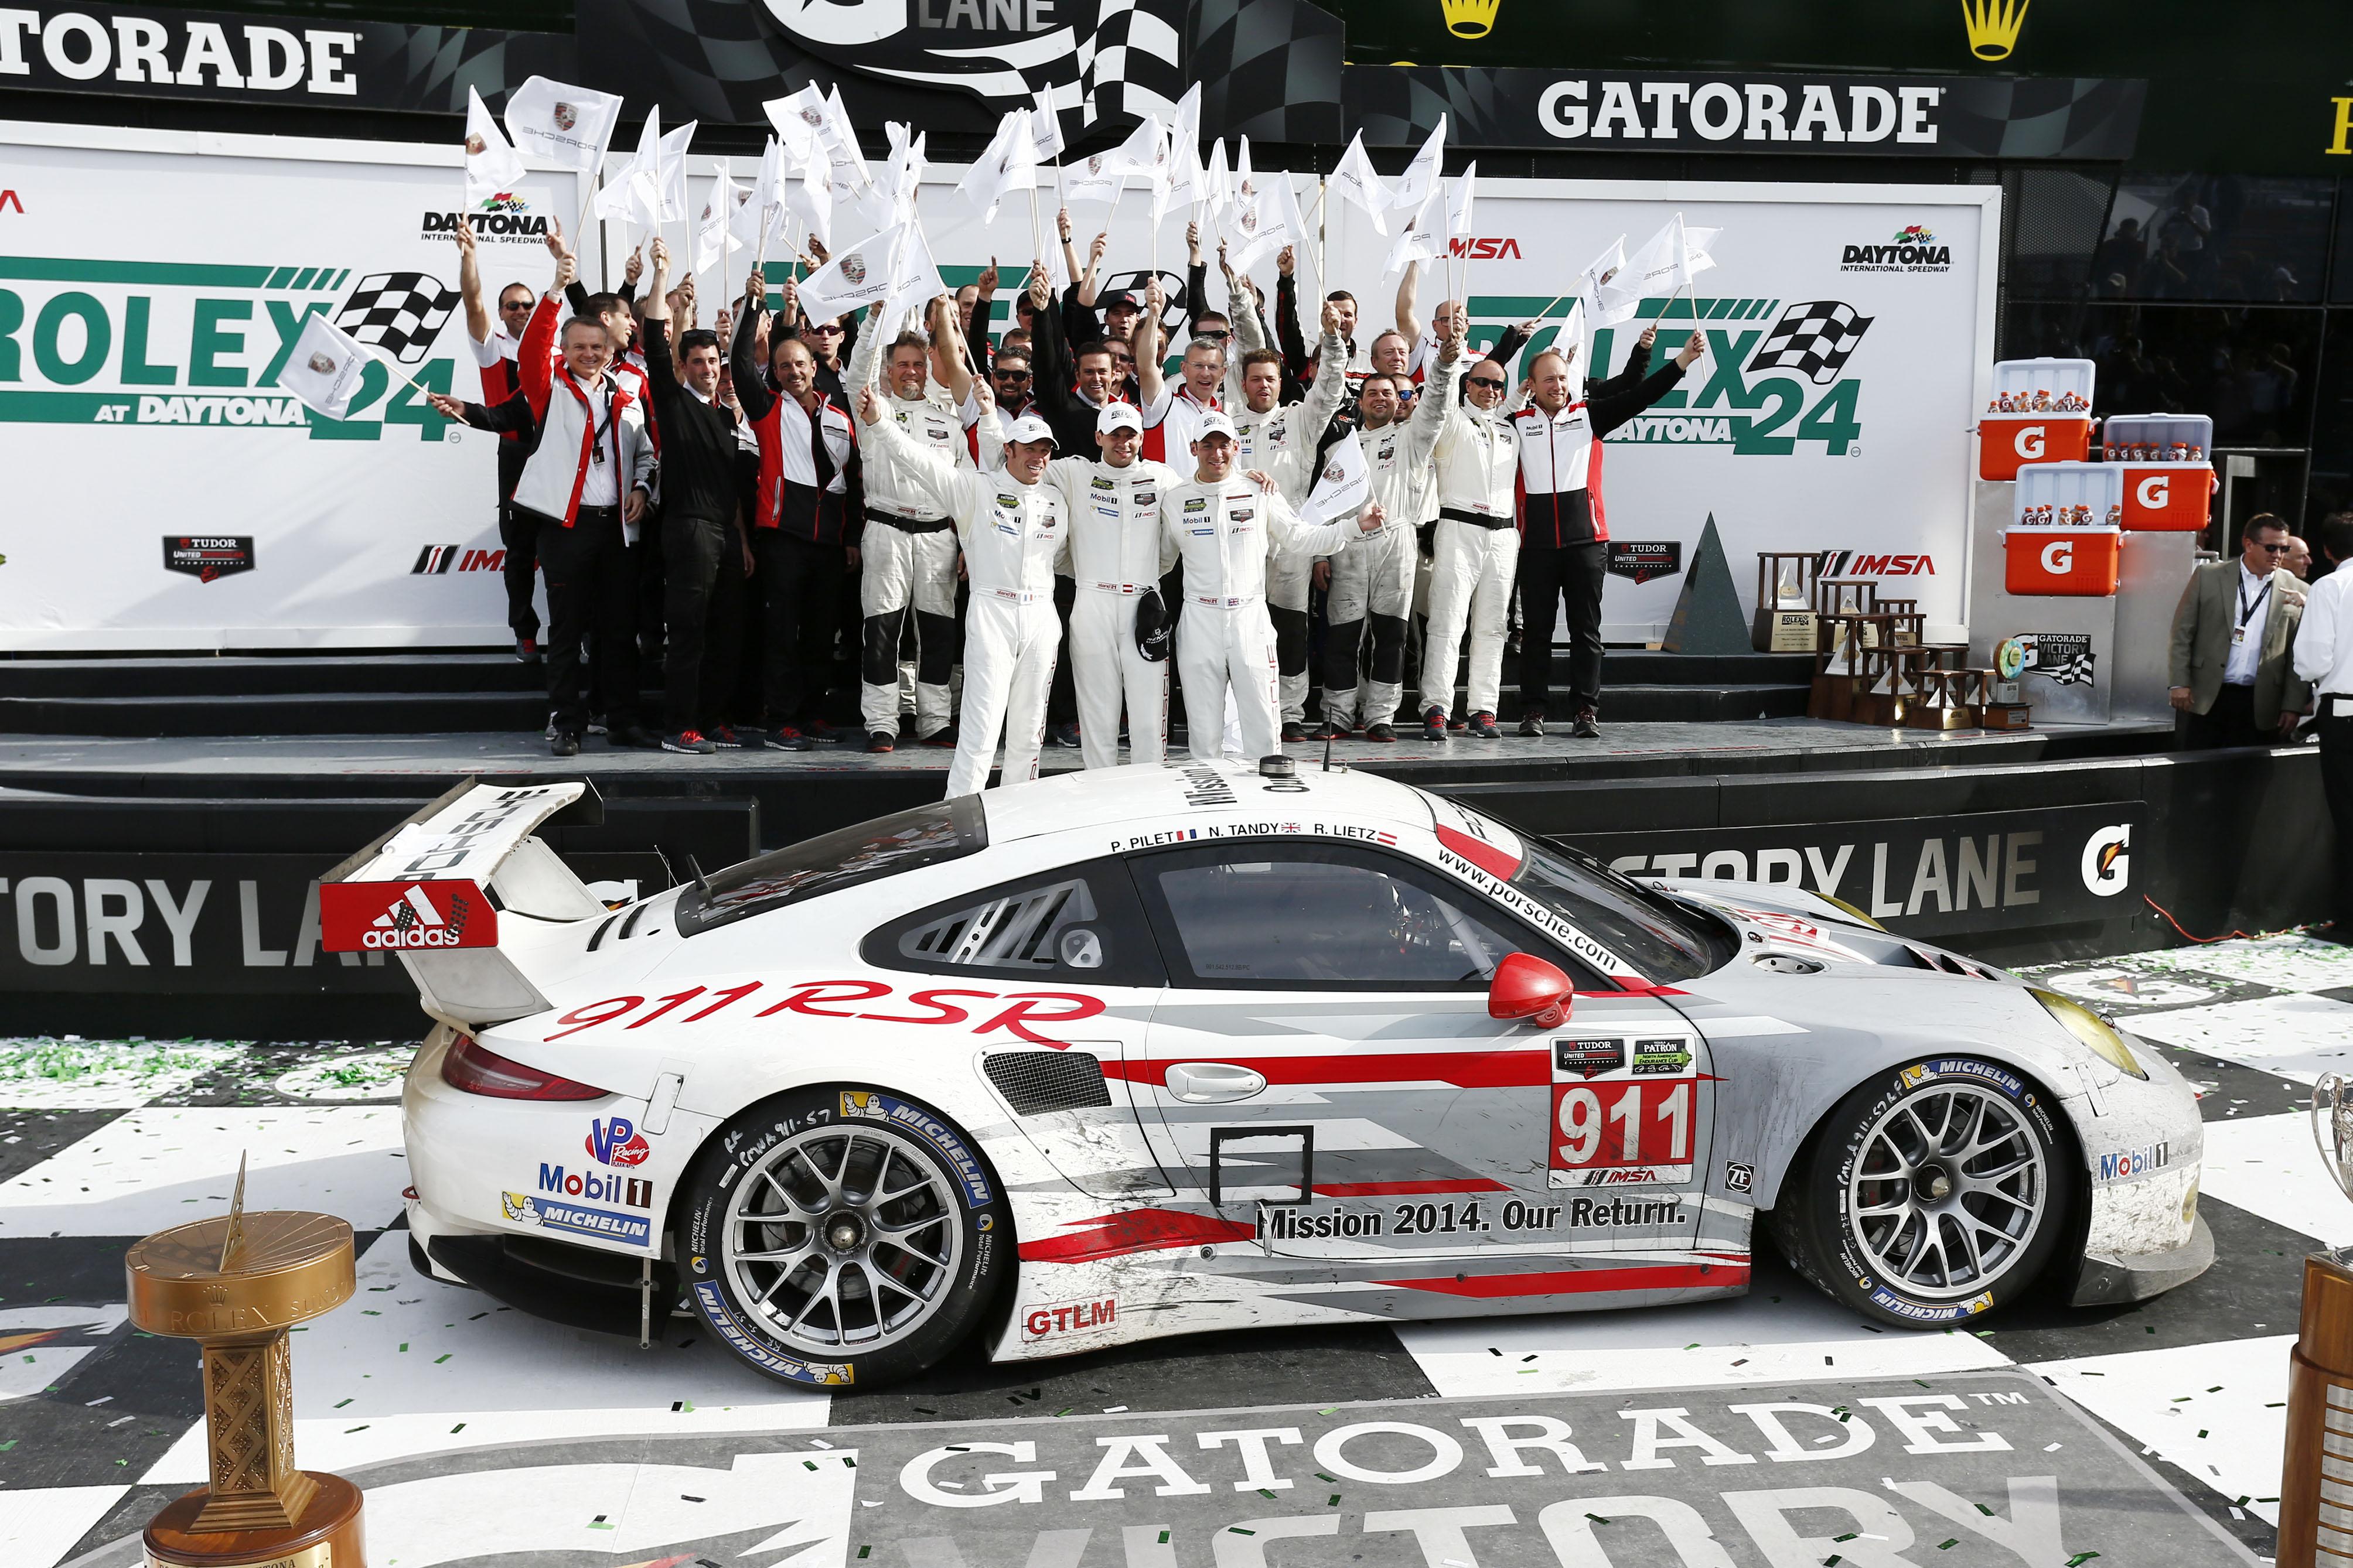 Porsche Opens 2014 Motor Sport Season With Daytona Victory